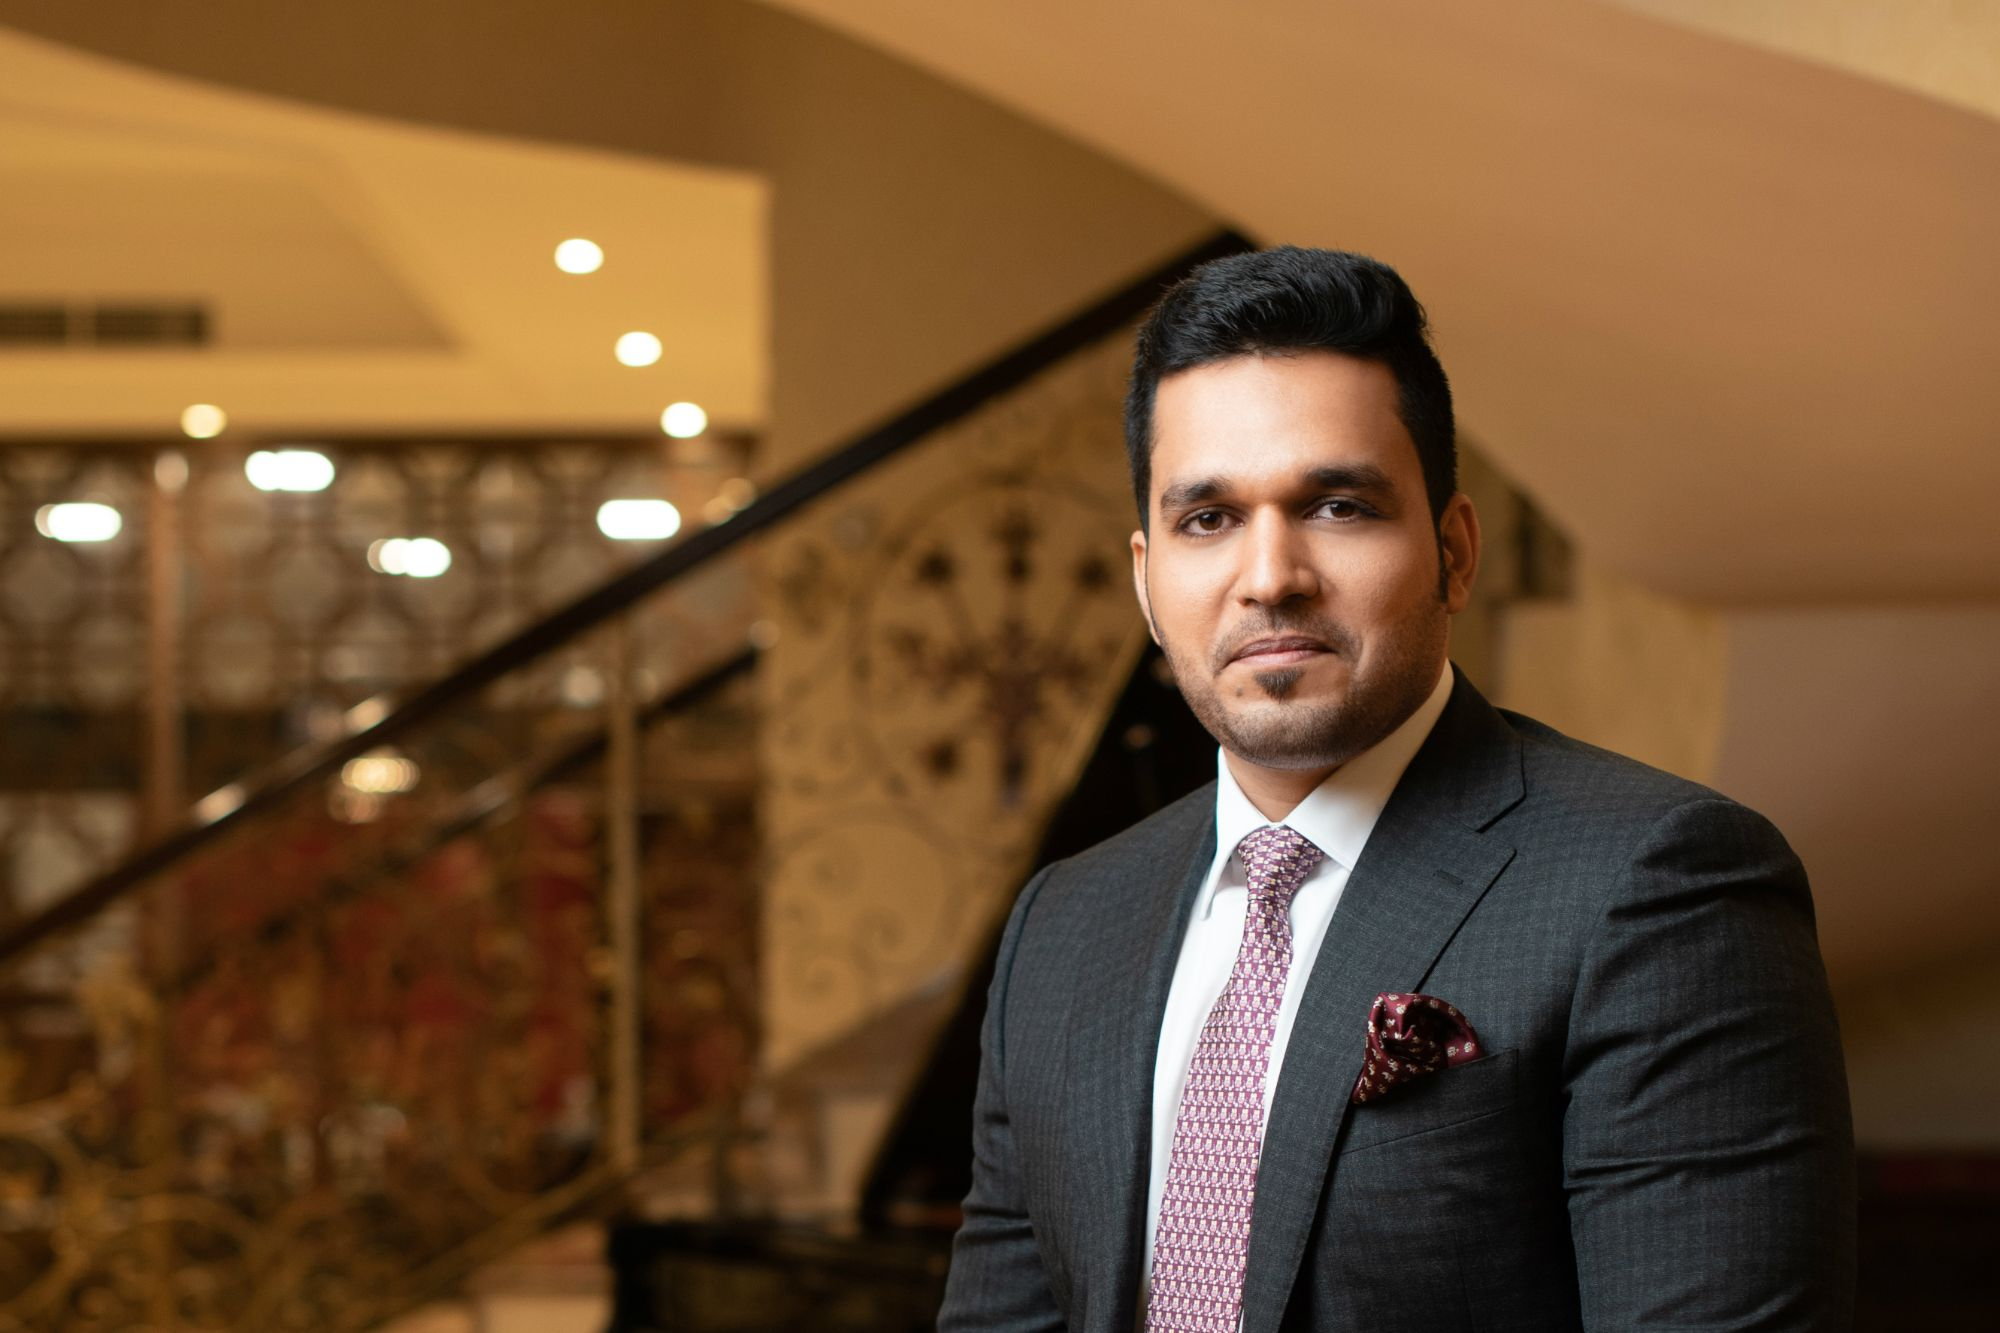 #22 Mohammed Jafer Musthafa, Founder and Managing Director, Daemaar Group